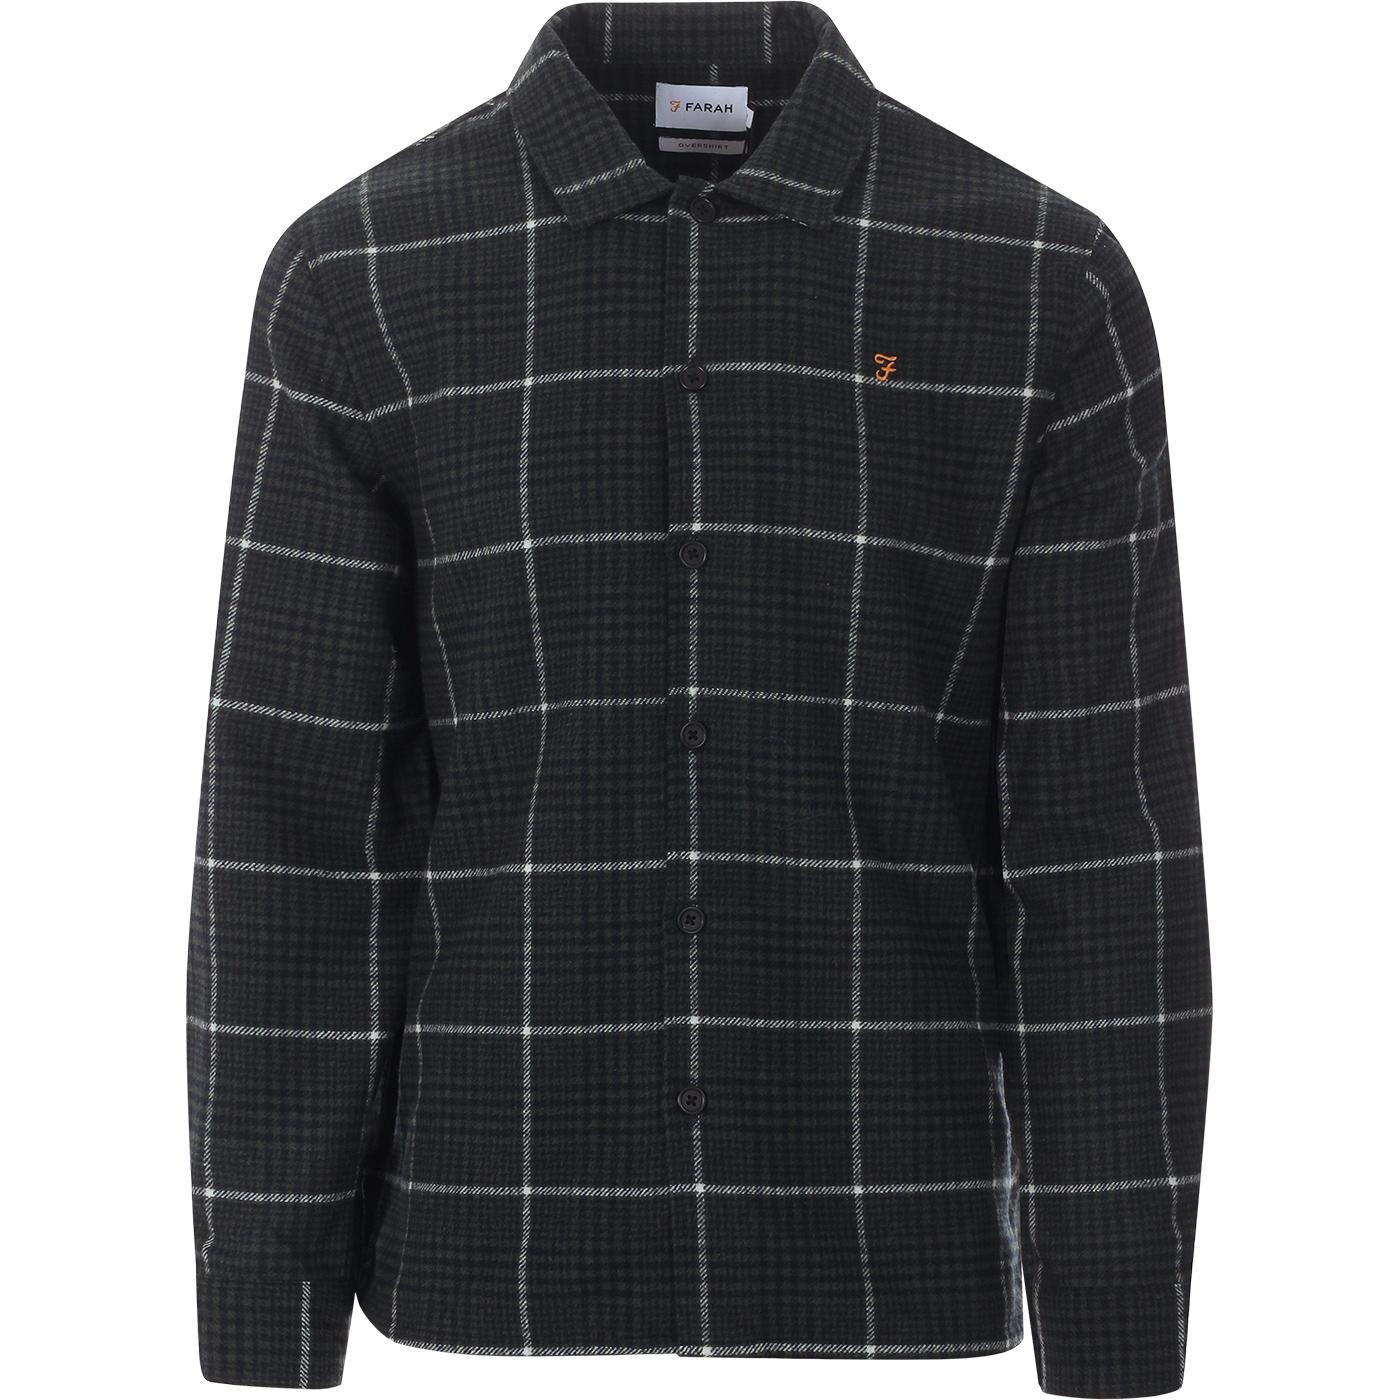 Choctaw FARAH Retro Mod Wool Blend Check Overshirt